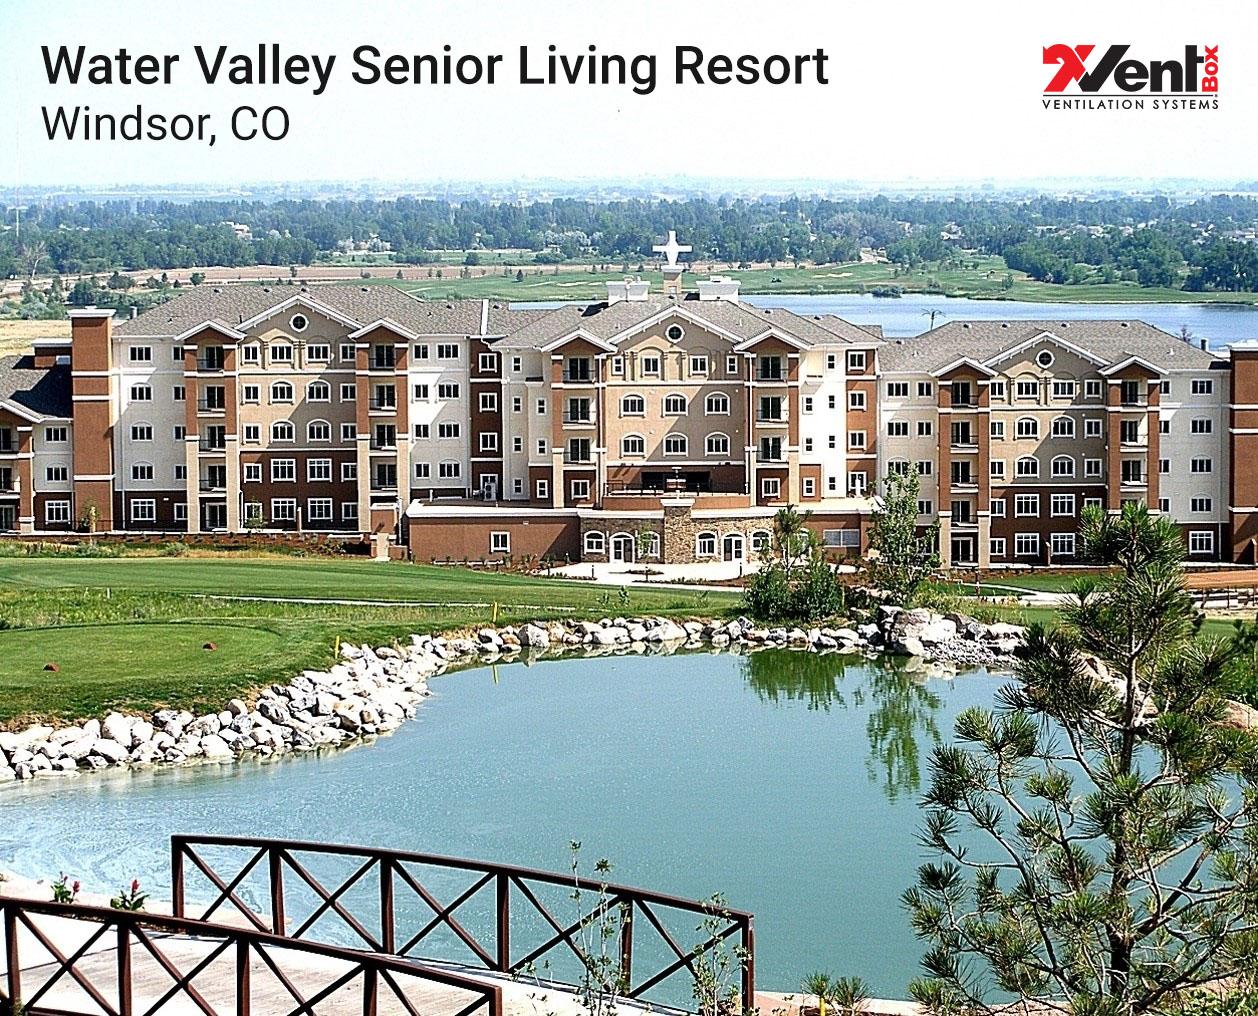 Water Valley Senior Living Resort